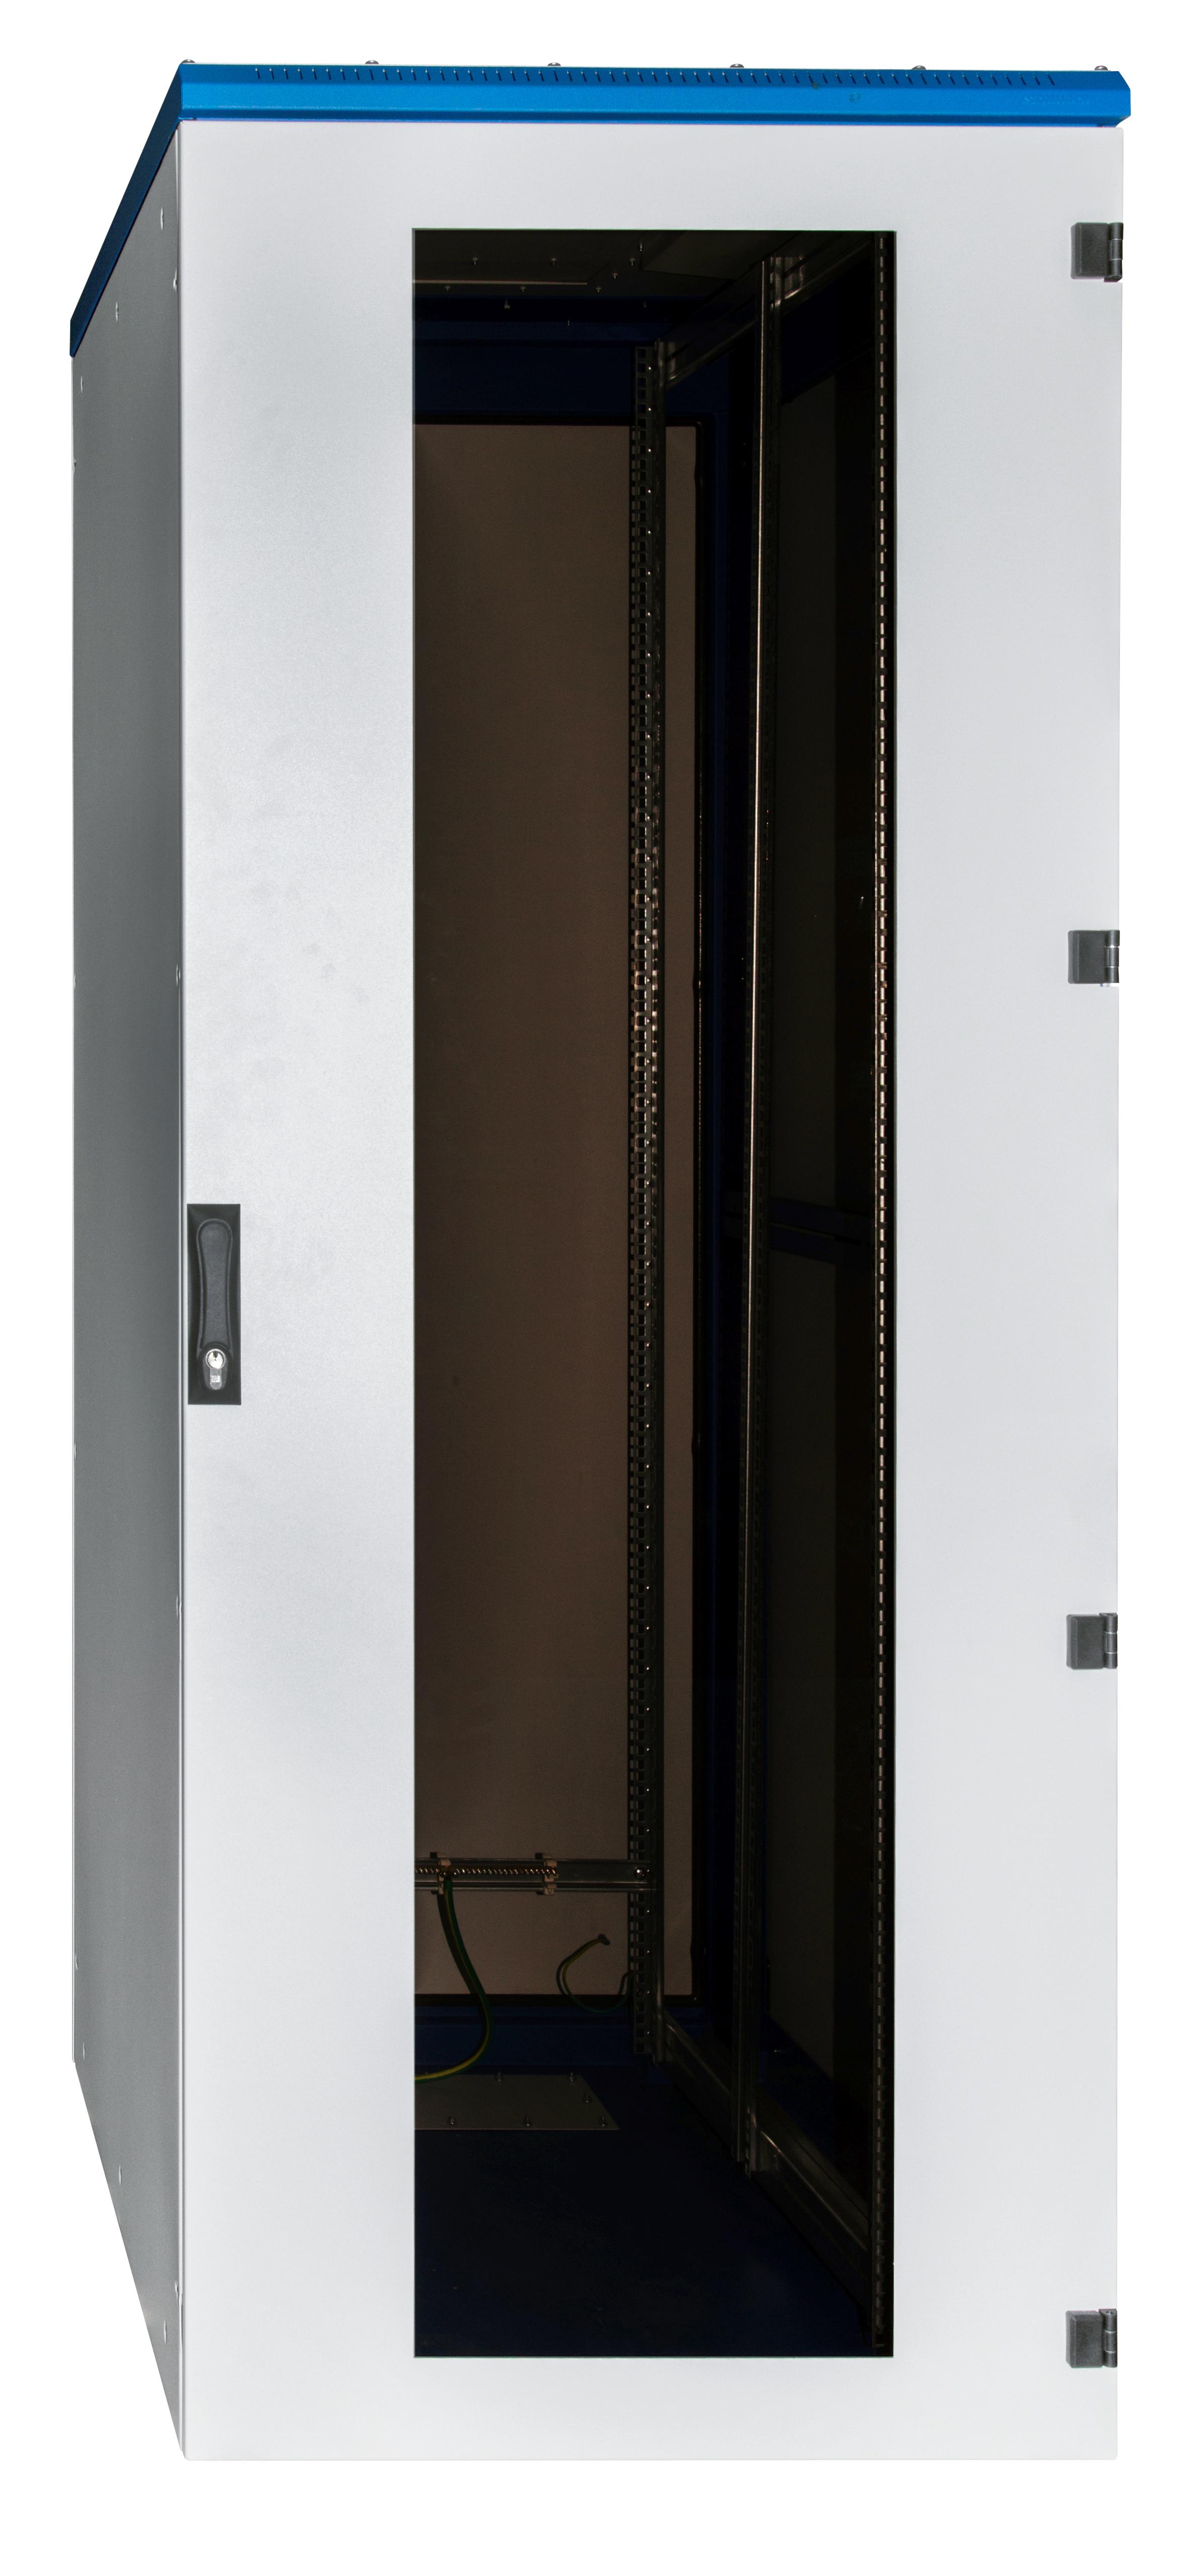 1 Stk Netzwerk-Standschrank DSI,B600 x H1970 x T1000,19,42HE,IP54 DSI426010-